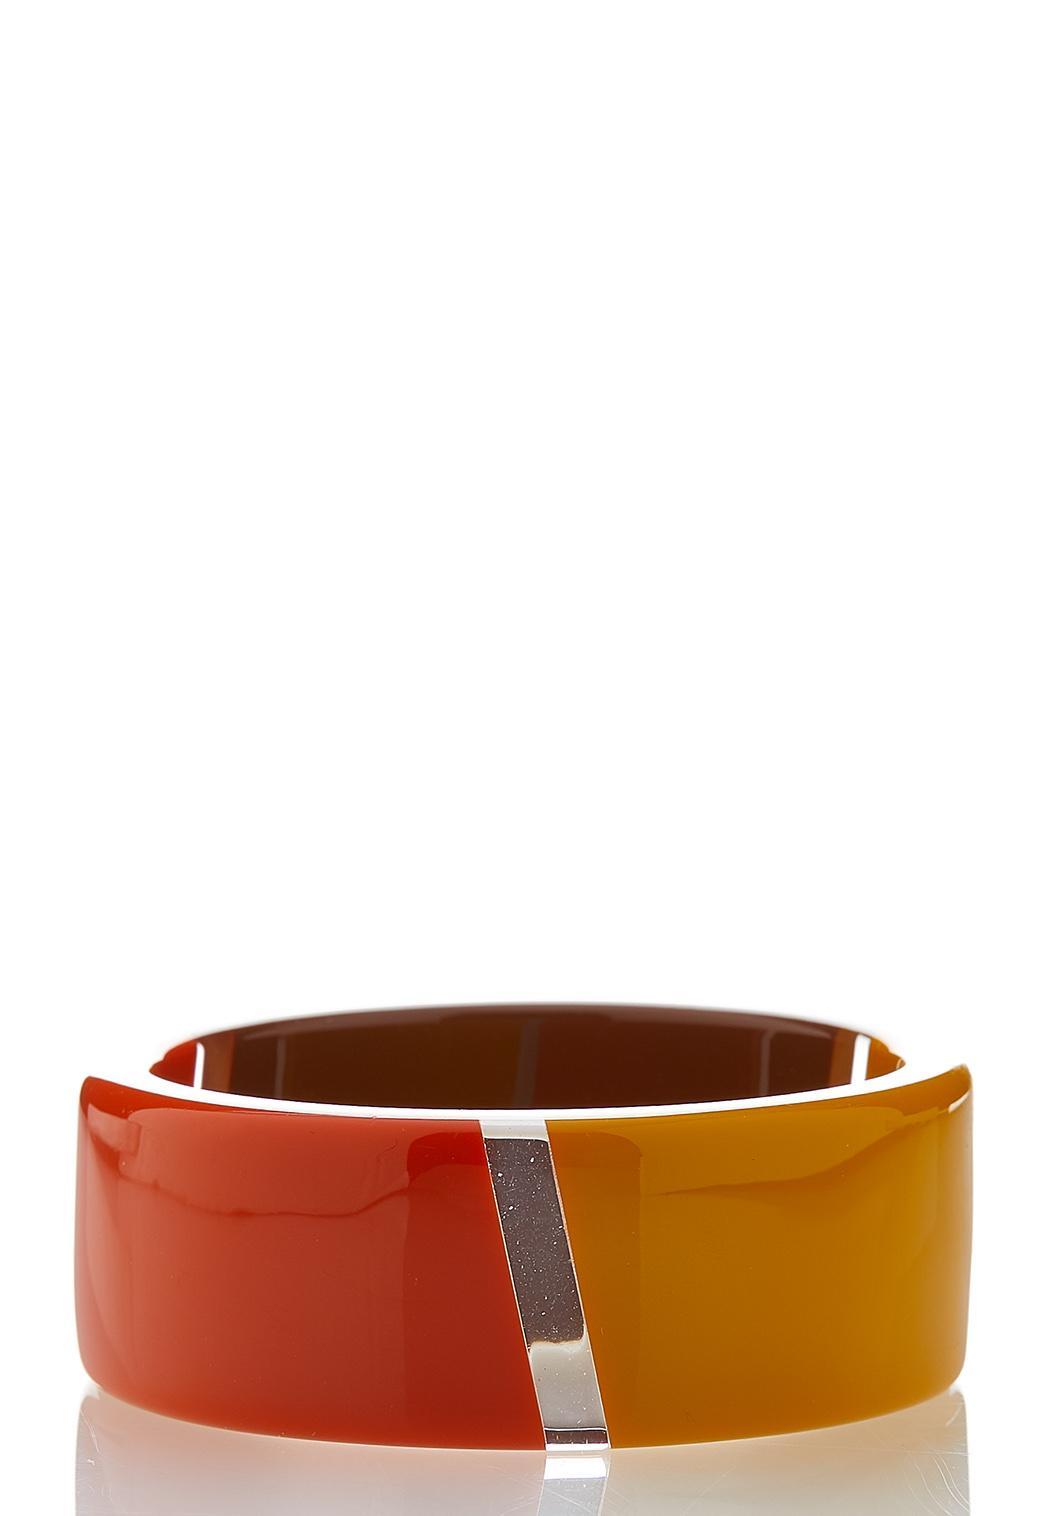 Autumn Resin Bangle Bracelet